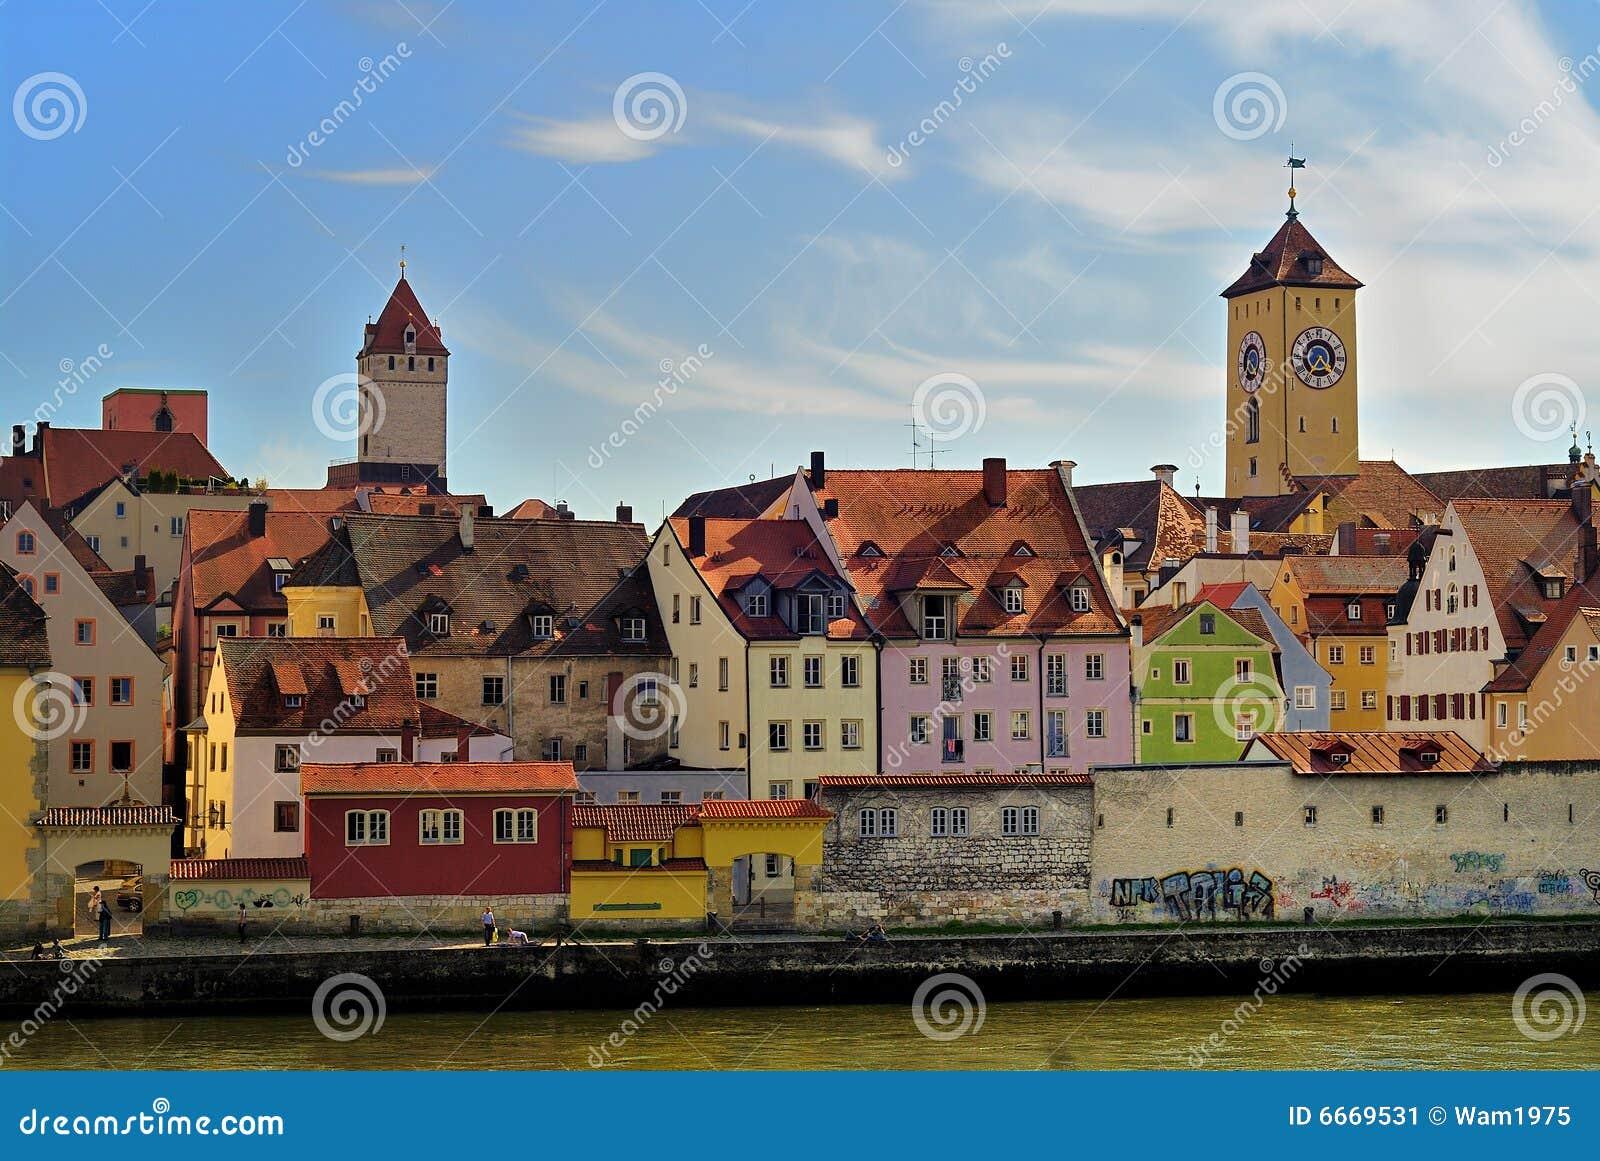 Germany regensburg